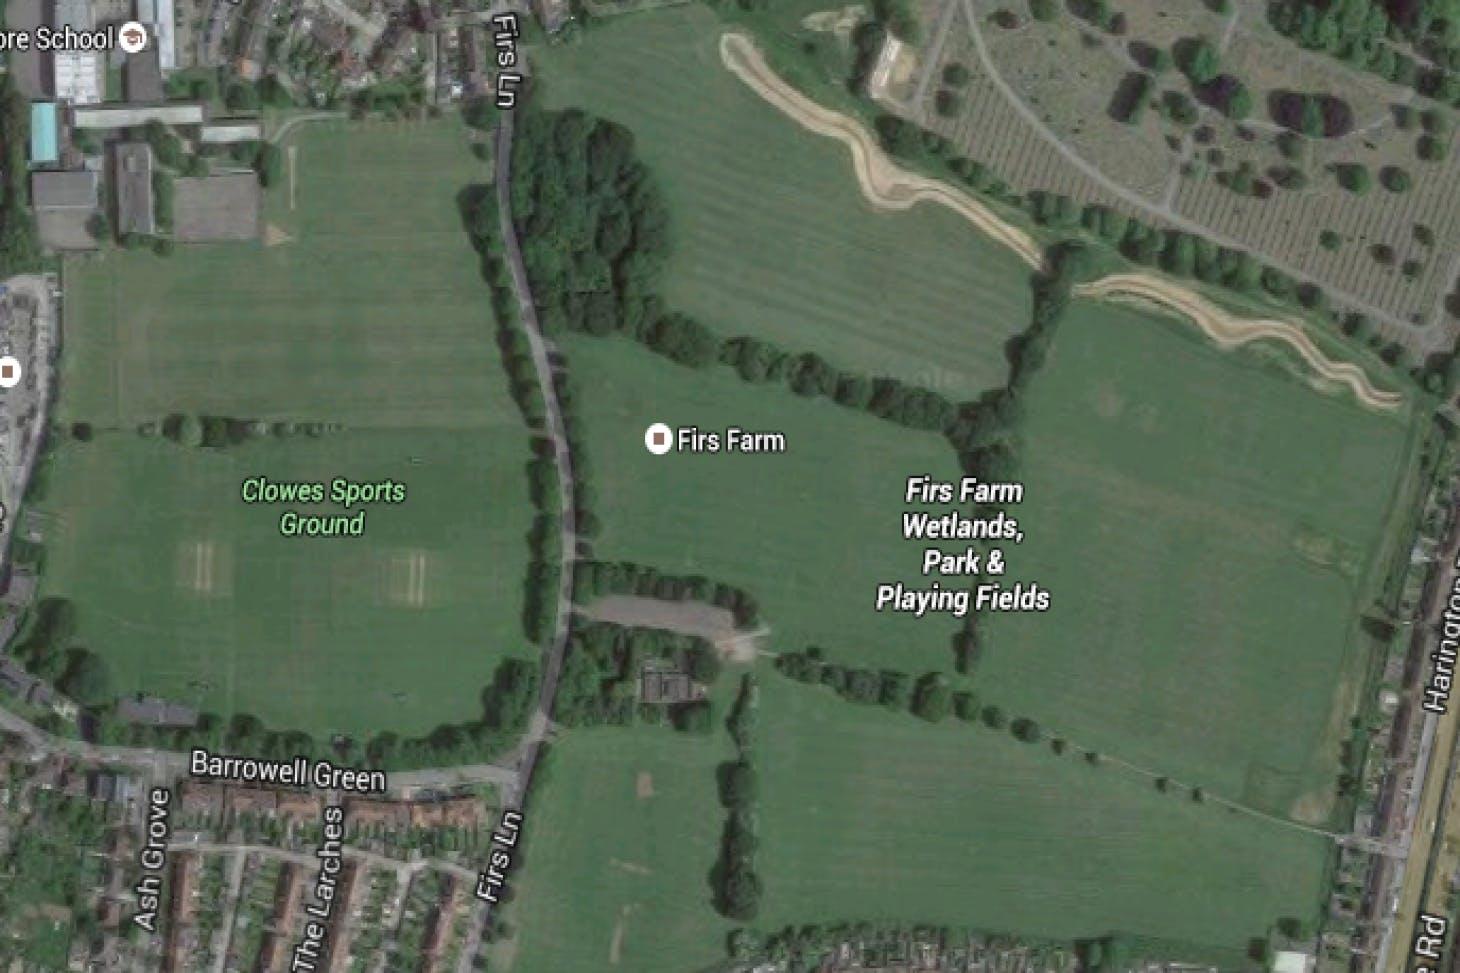 Firs Farm 11 a side | Grass football pitch